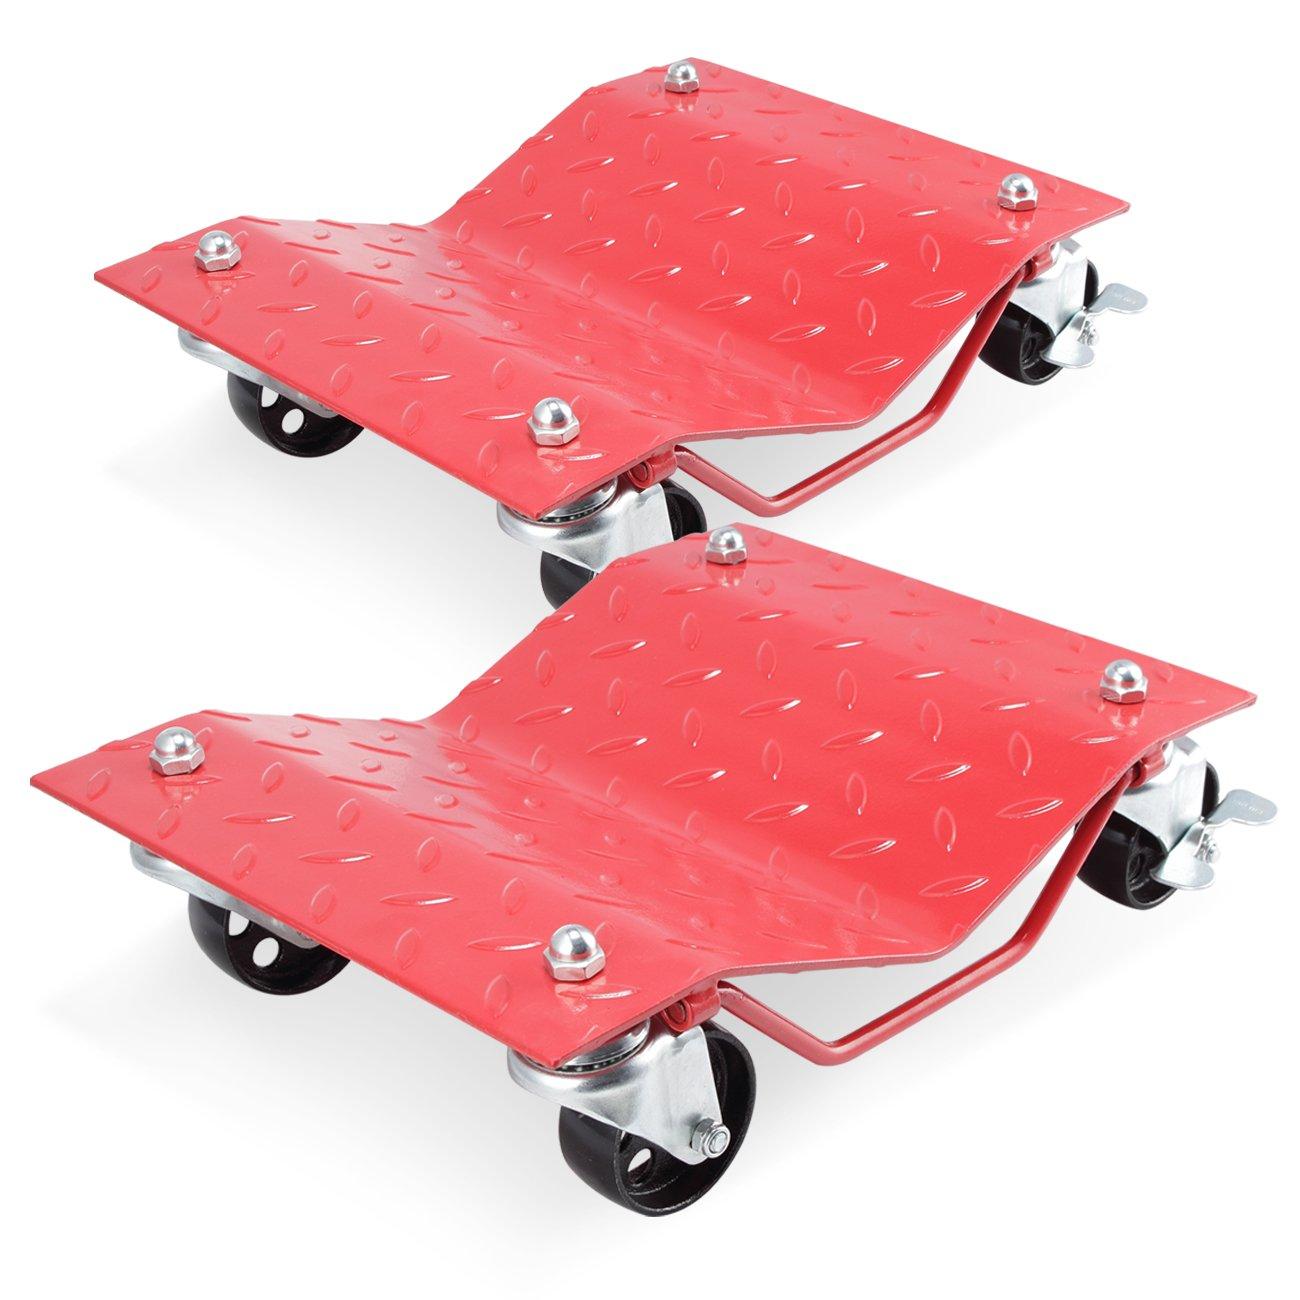 ARKSEN 2 Pack Set Heavy Duty Dollies Car Auto Repair Dolly Tire Skates Vehicle Moving Diamond w/Wheels & Lock, Red